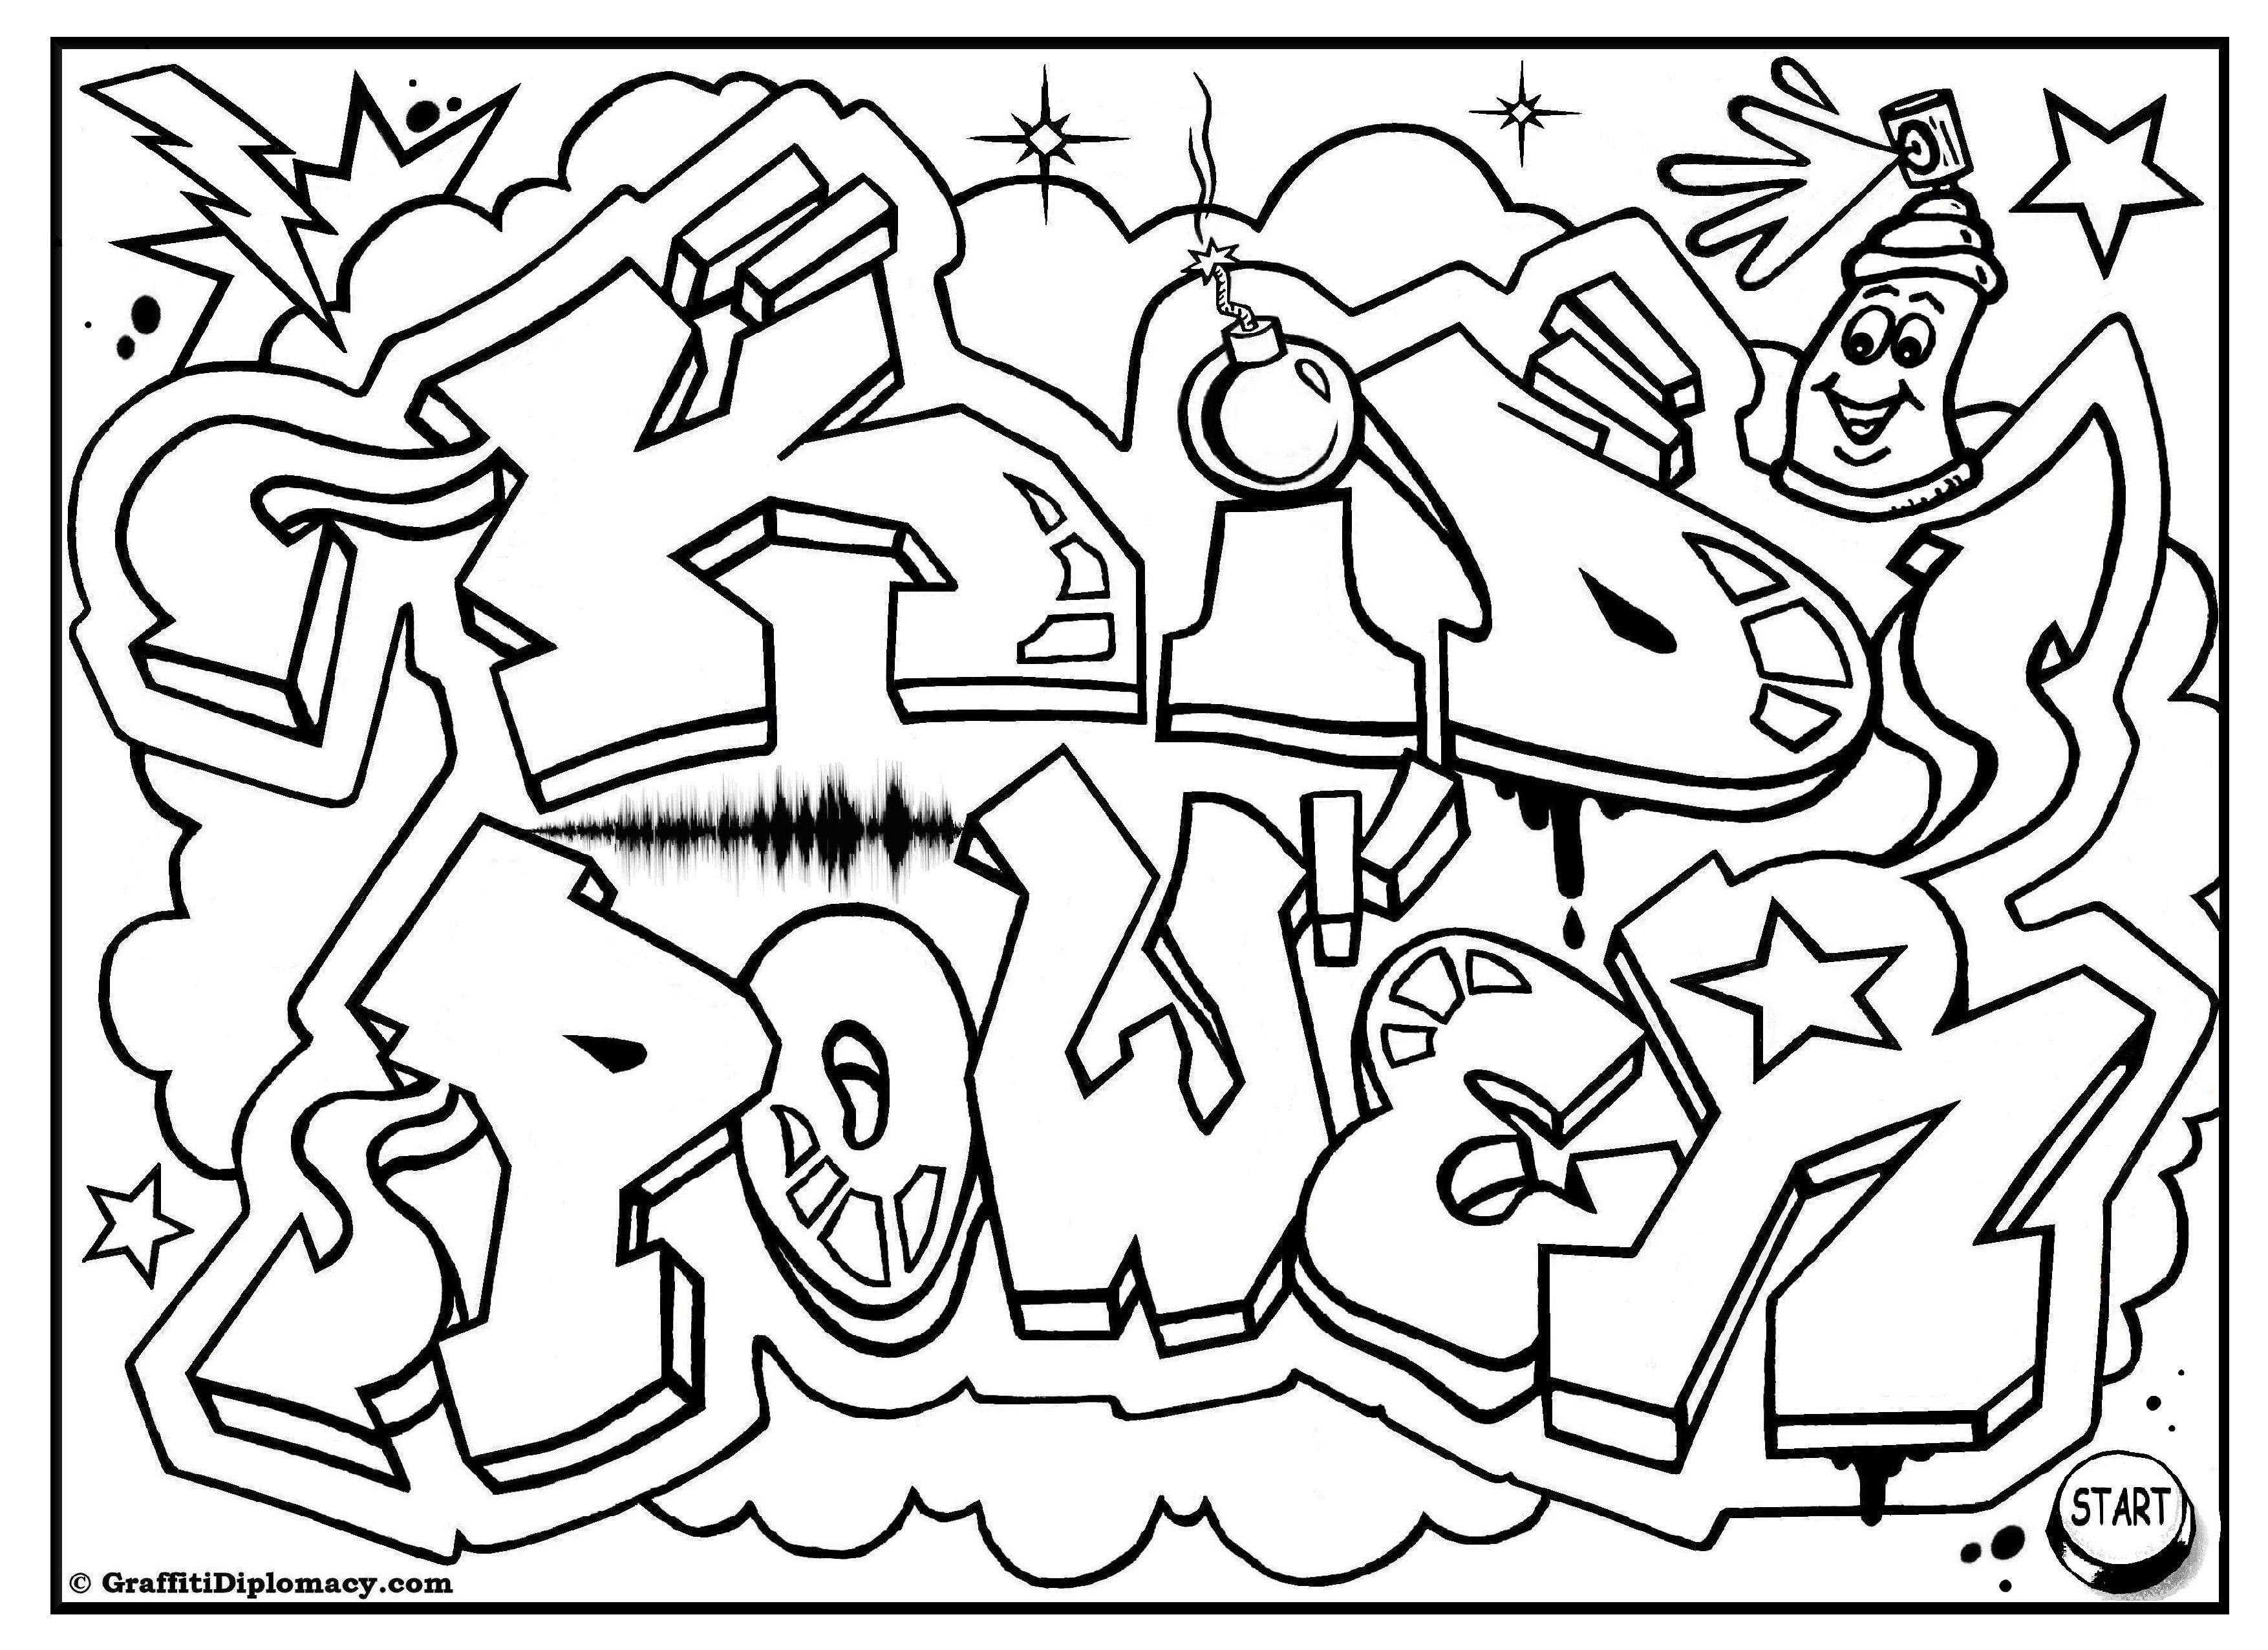 Kid Power Free Graffiti Coloring Page Free Printable Colouring Sheet Coloring Book Art Book Art Coloring Books